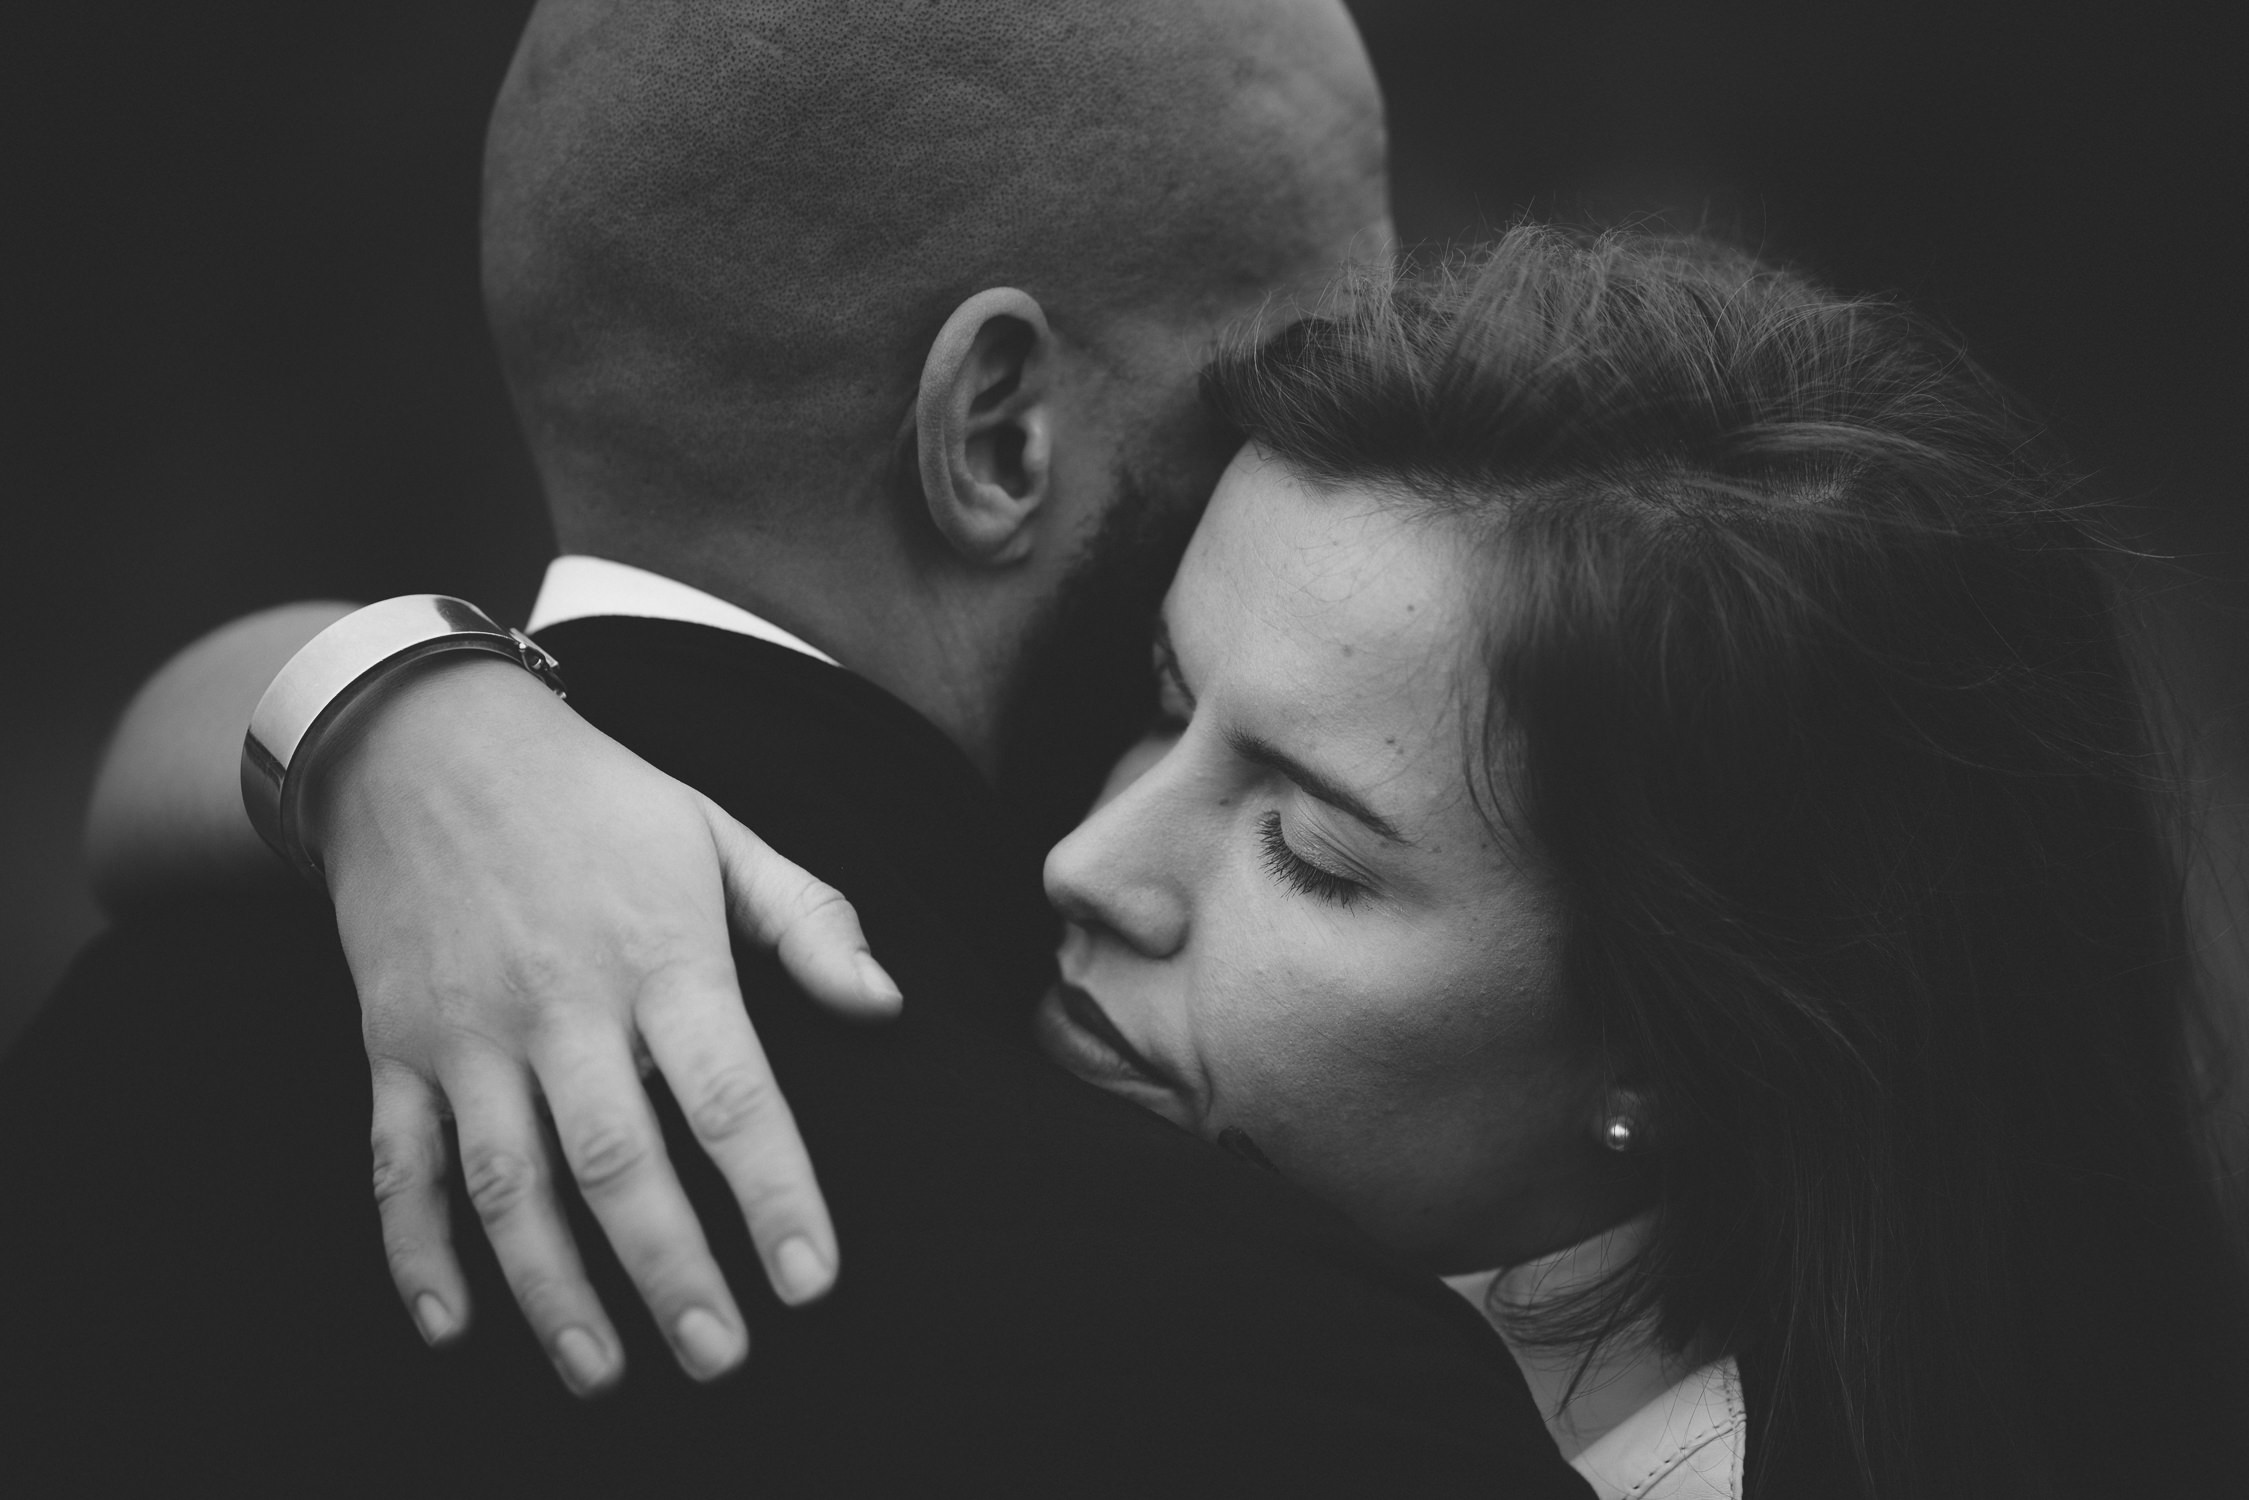 bruidsfotografie-loveshoot-amsterdam-rotterdam-utrecht-mark-hadden-wedding-photographer-bianca-rutger-181-2.jpg